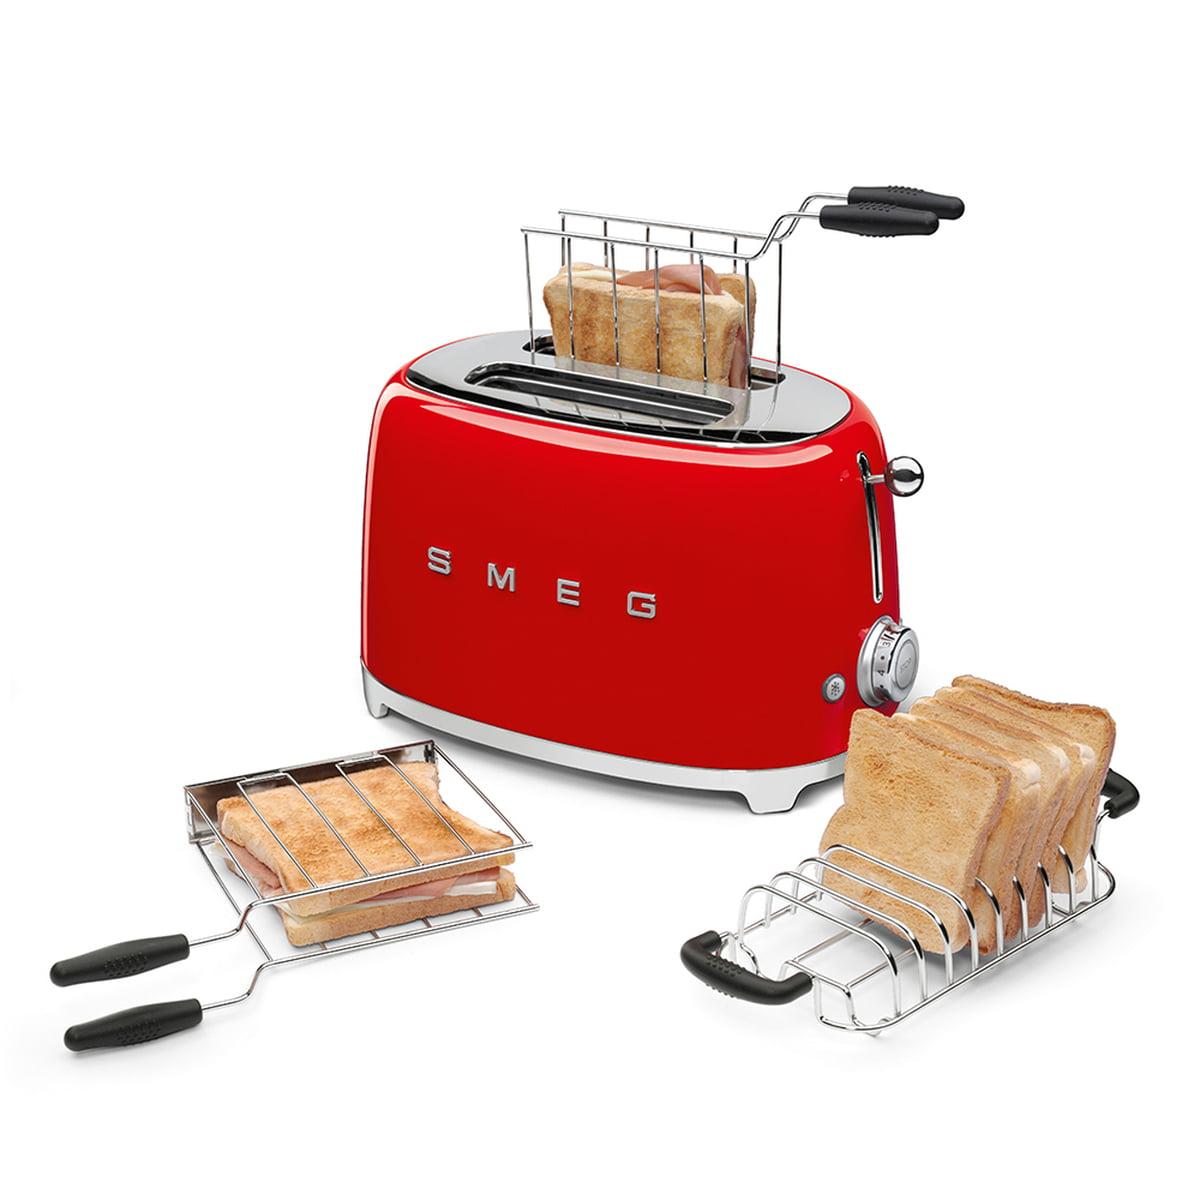 sandwich zangen f r tsf01 tsf03 toaster von smeg. Black Bedroom Furniture Sets. Home Design Ideas